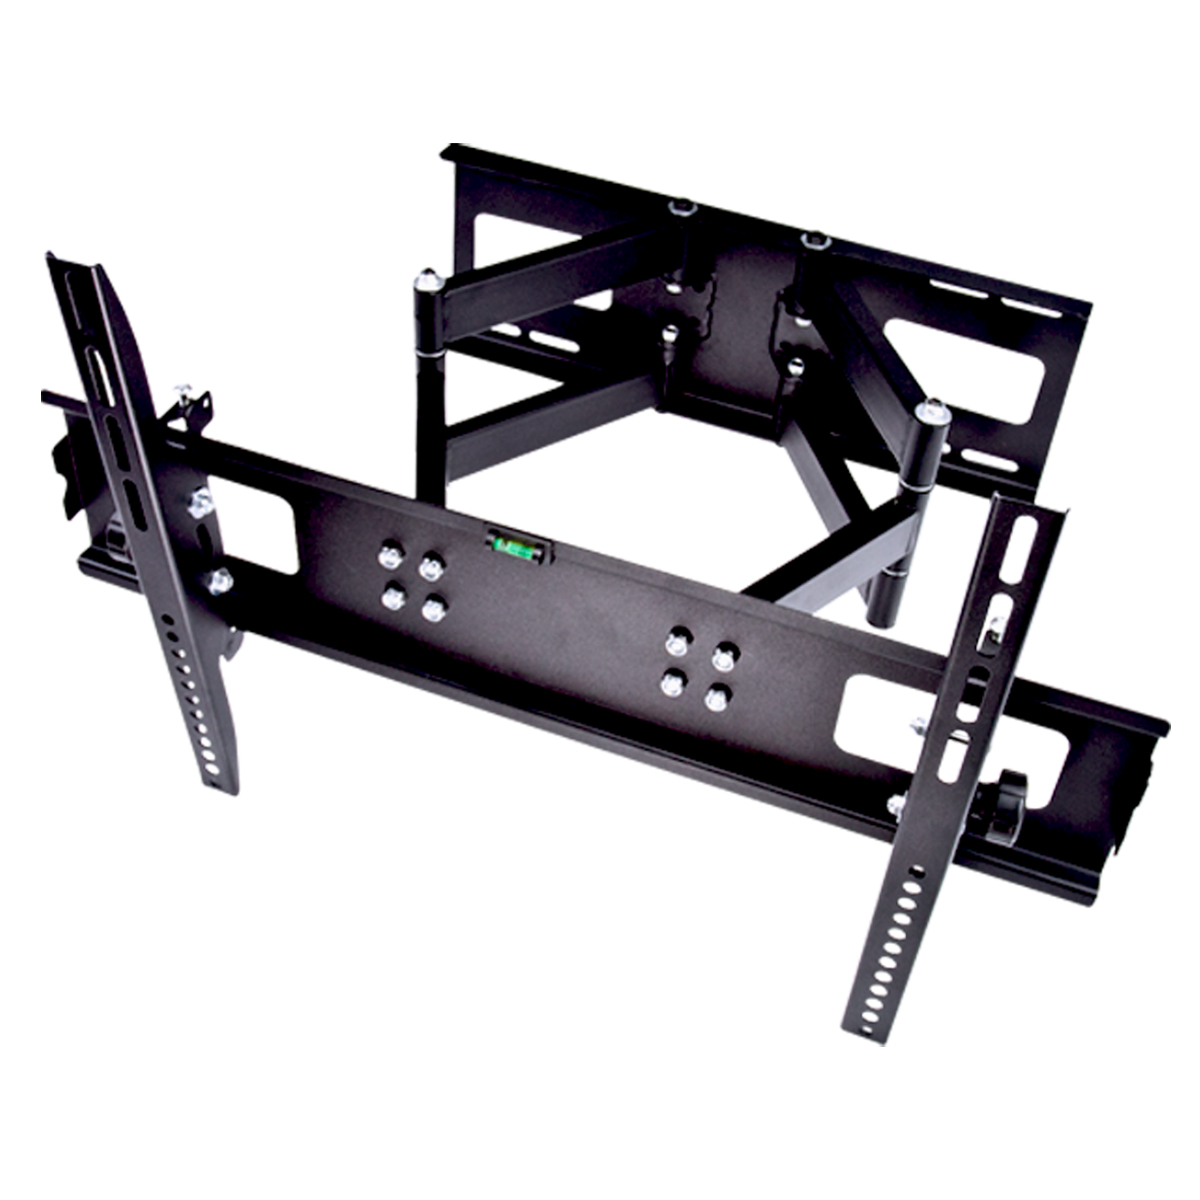 swivel arm 32 60 lcd led tv wall mount full motion tilt dvd stand 2 tier ebay. Black Bedroom Furniture Sets. Home Design Ideas